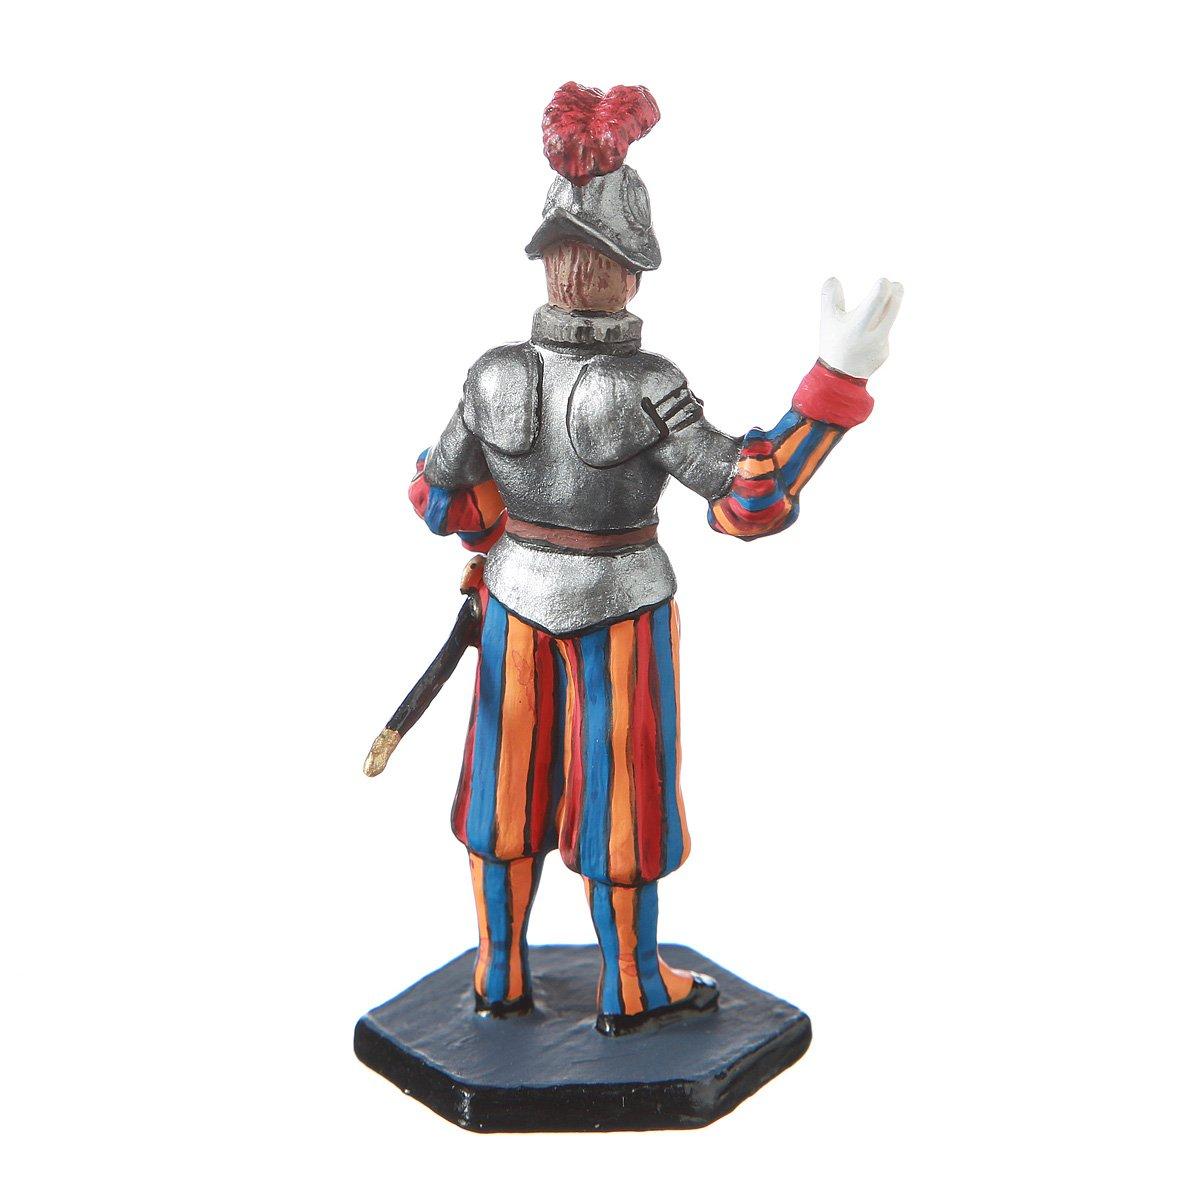 danila-souvenirs Tin Toy Soldier Vatican Swiss Guard Private Hand Painted Metal Sculpture Miniature Figurine 54mm #14.68